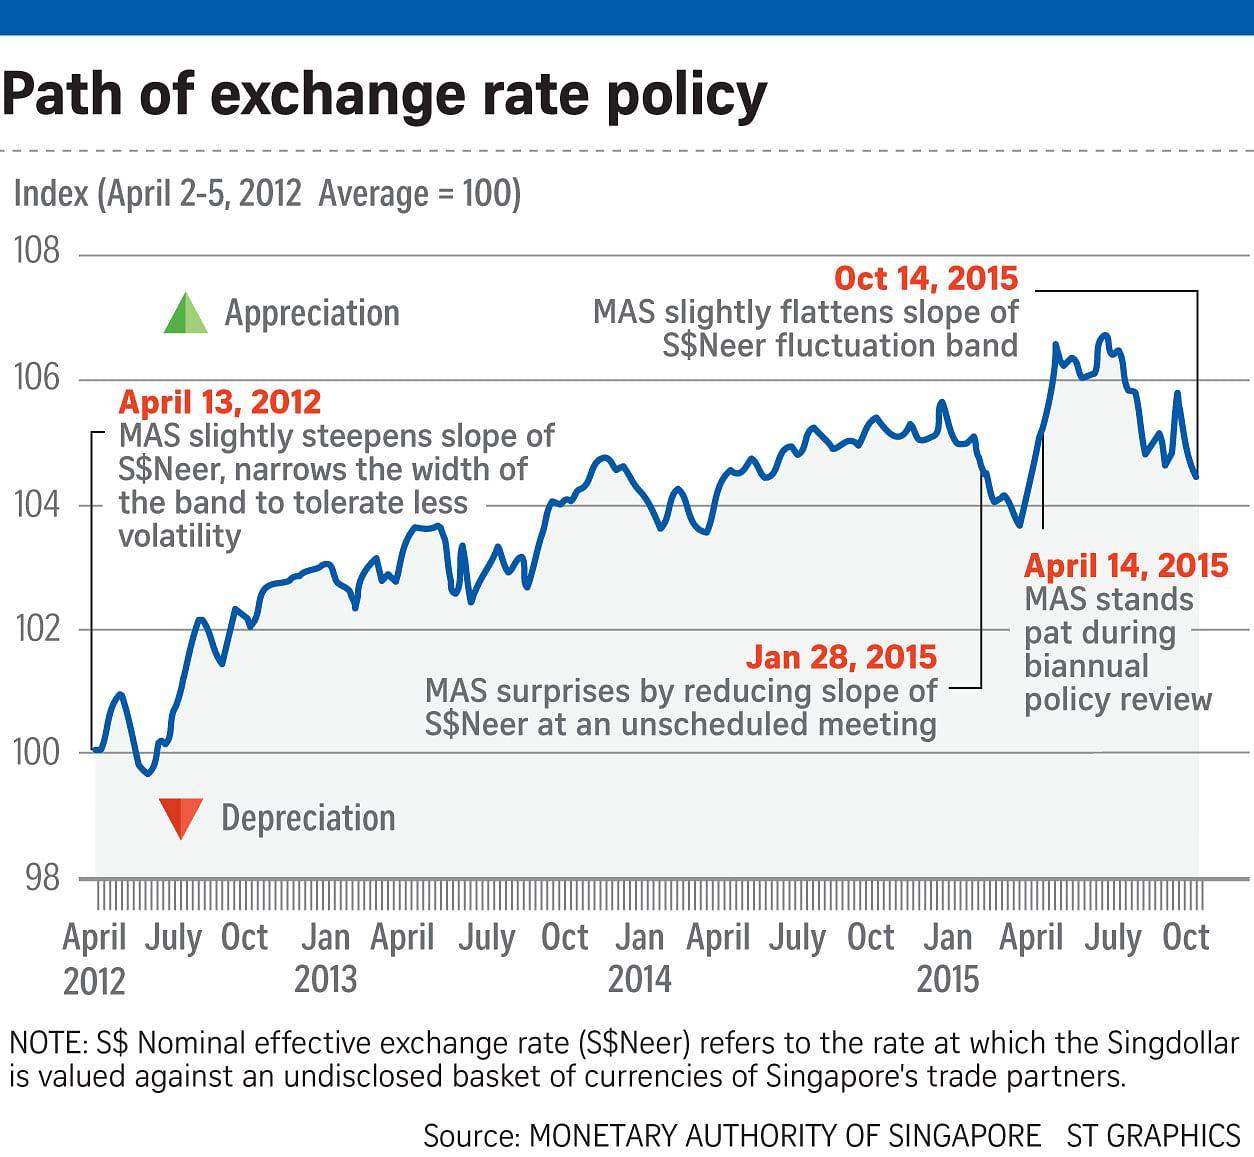 MAS slows pace of Singdollar gain 'slightly', Business ... - photo#47